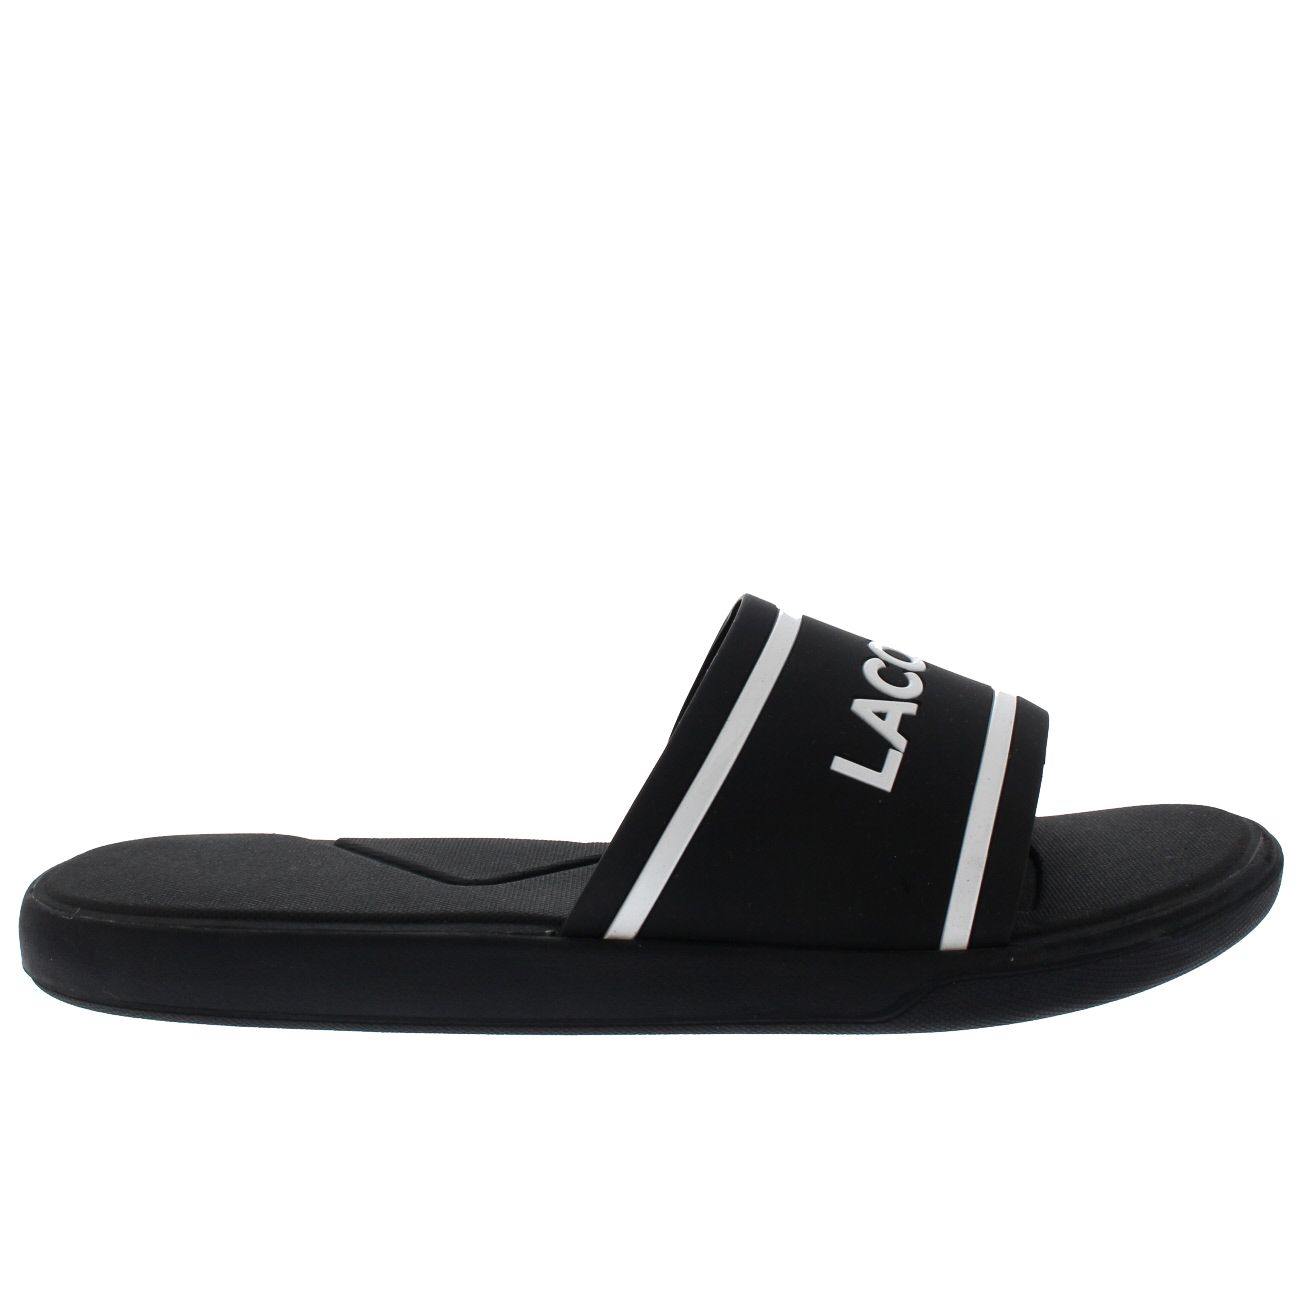 4b6e5ff9e1ab ... Mens Lacoste L.30 118 118 118 2 Slides Rubber Lightweight Summer Open  Toe Sandal